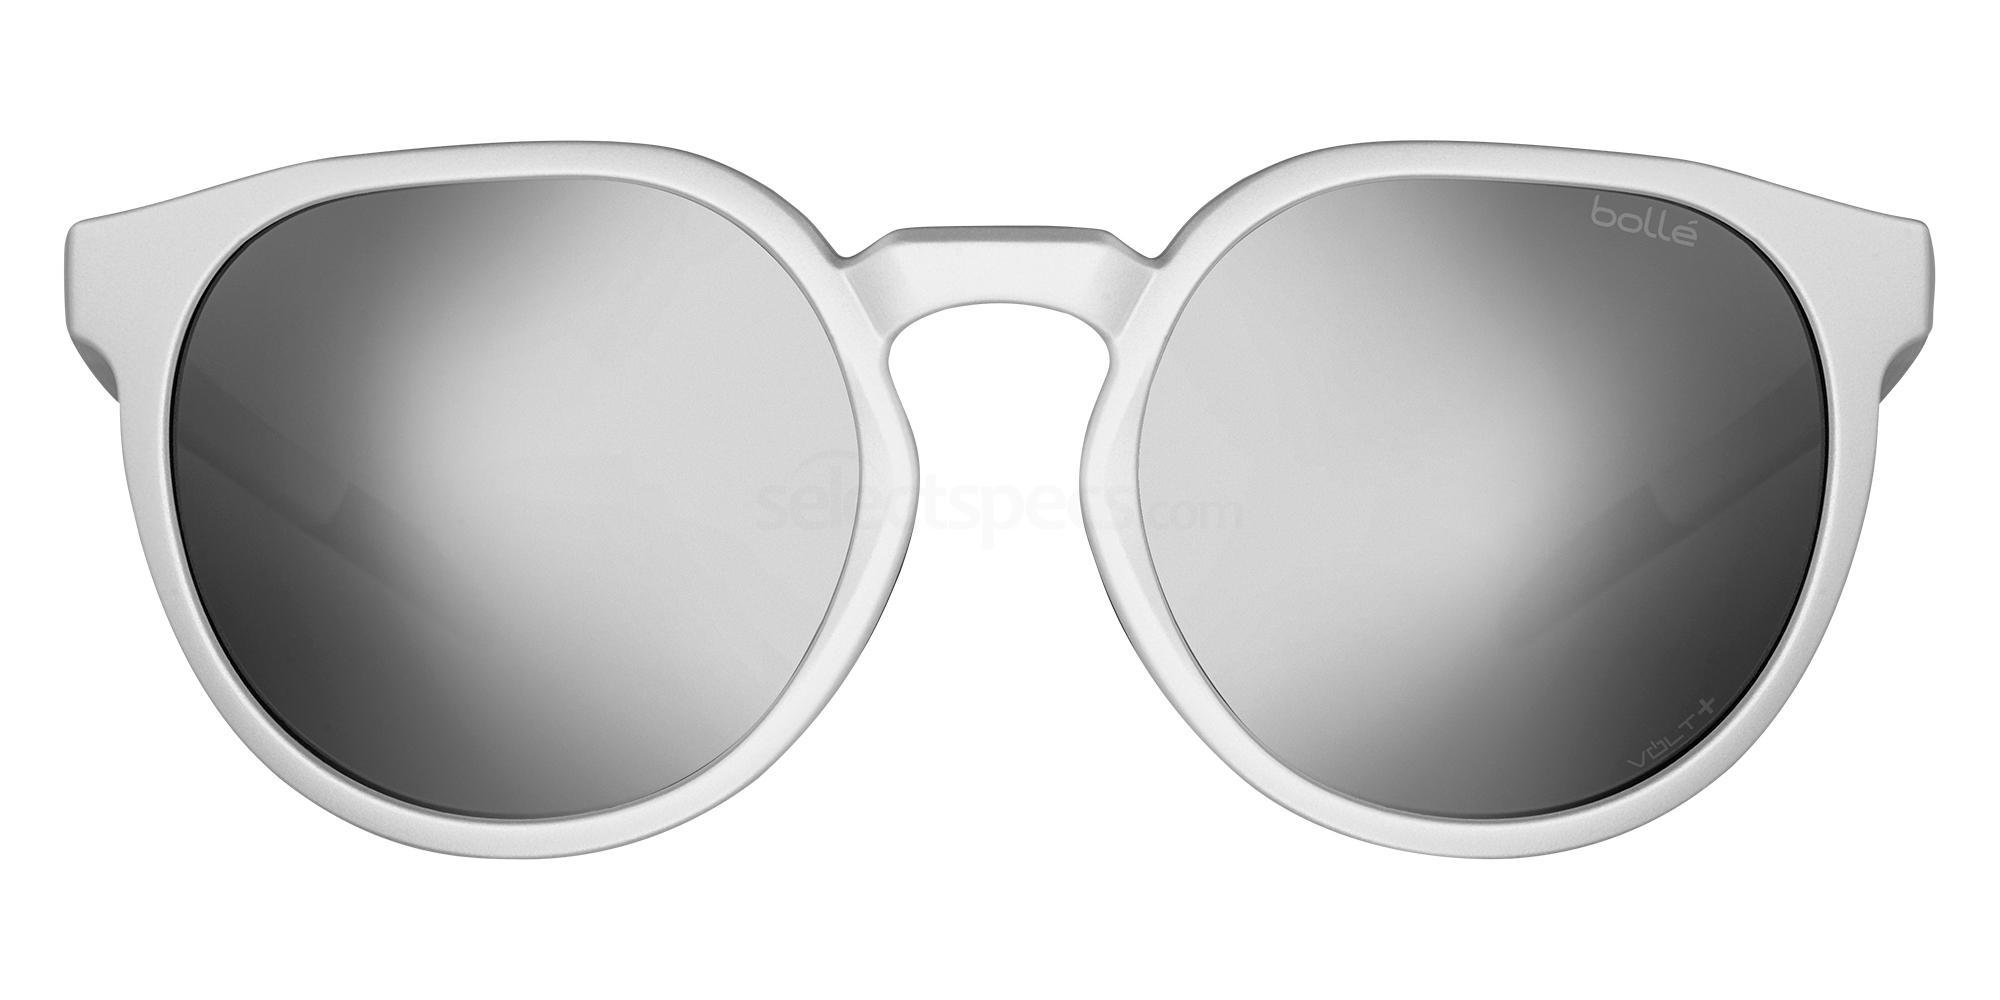 BS015001 MERIT Polarized Sunglasses, Bolle